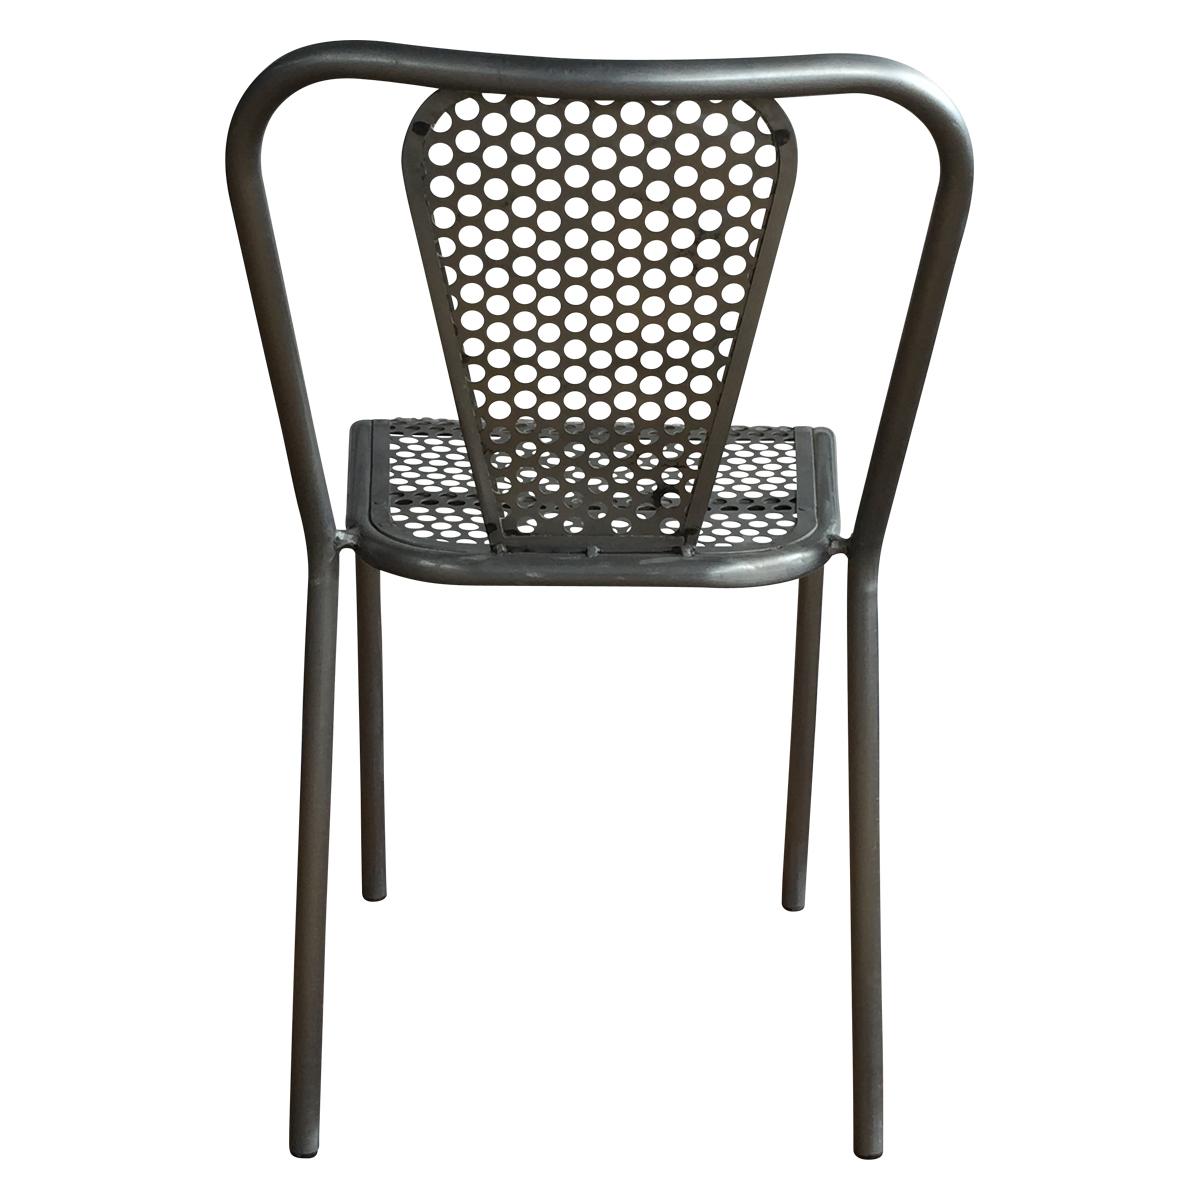 Chaise en m tal grise style industriel demeure et jardin - Chaise en fer industriel ...